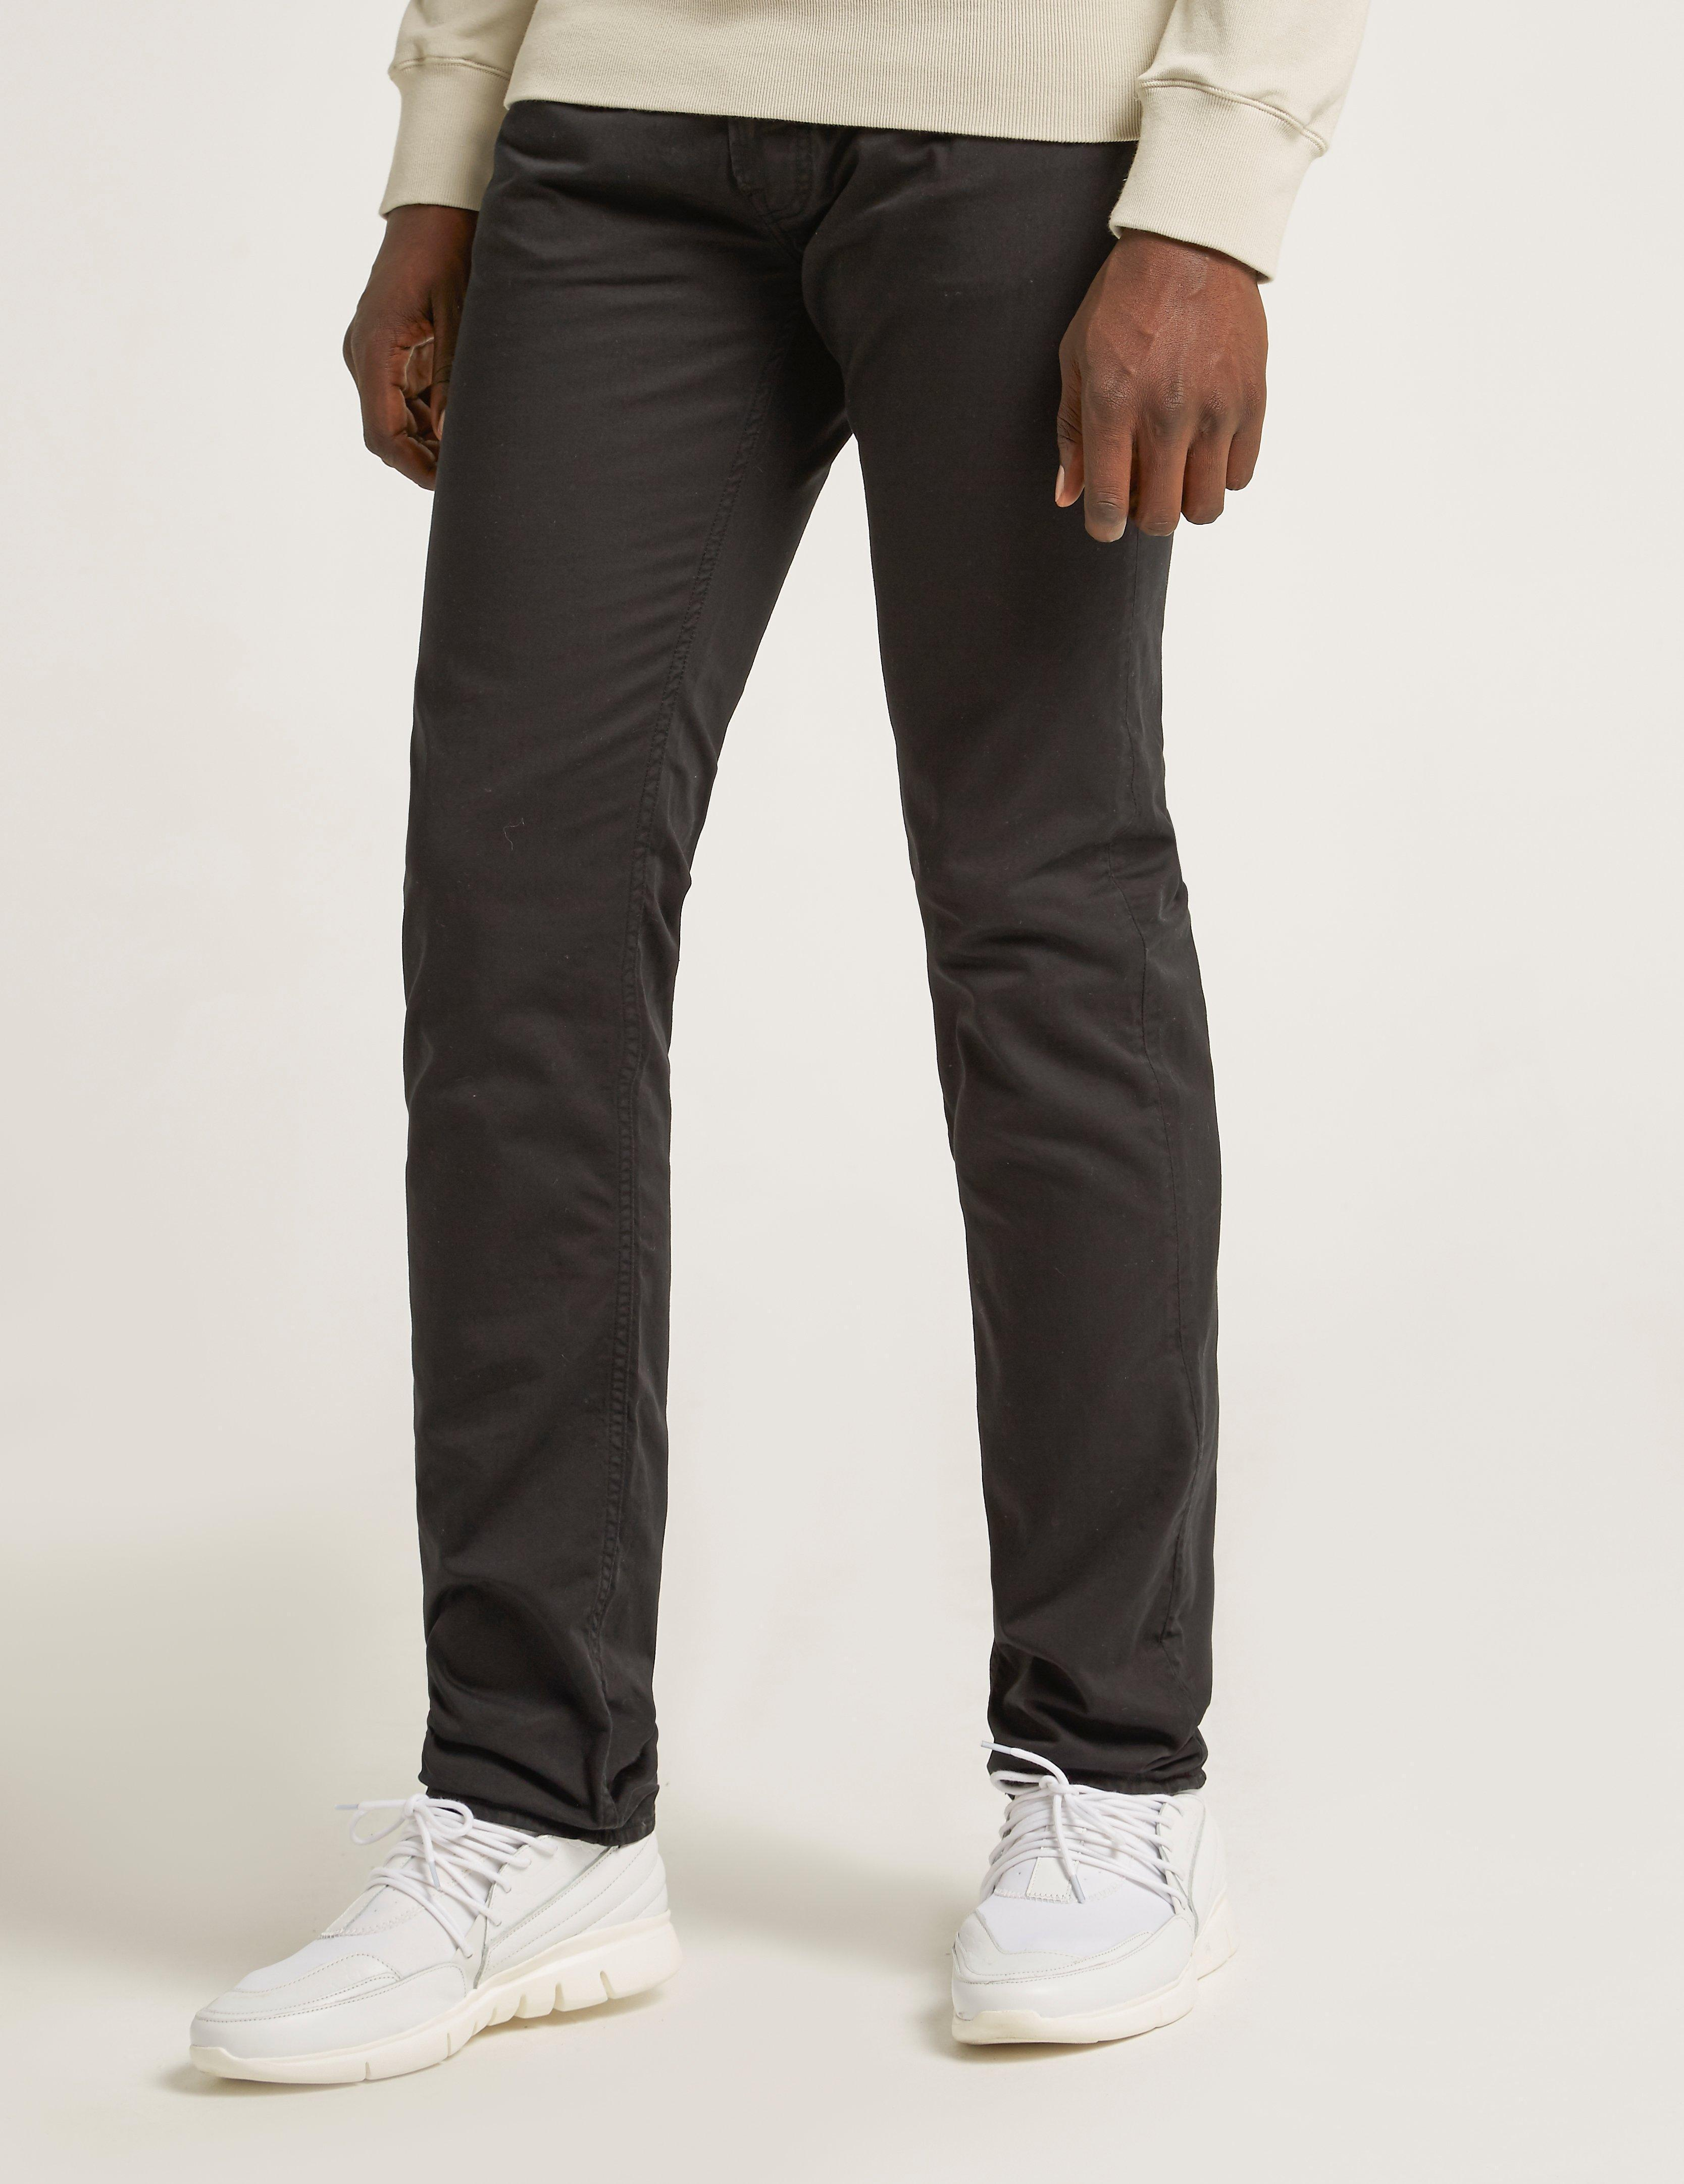 Stone Island Denim Slim Satine Gabardine Jeans Black for Men